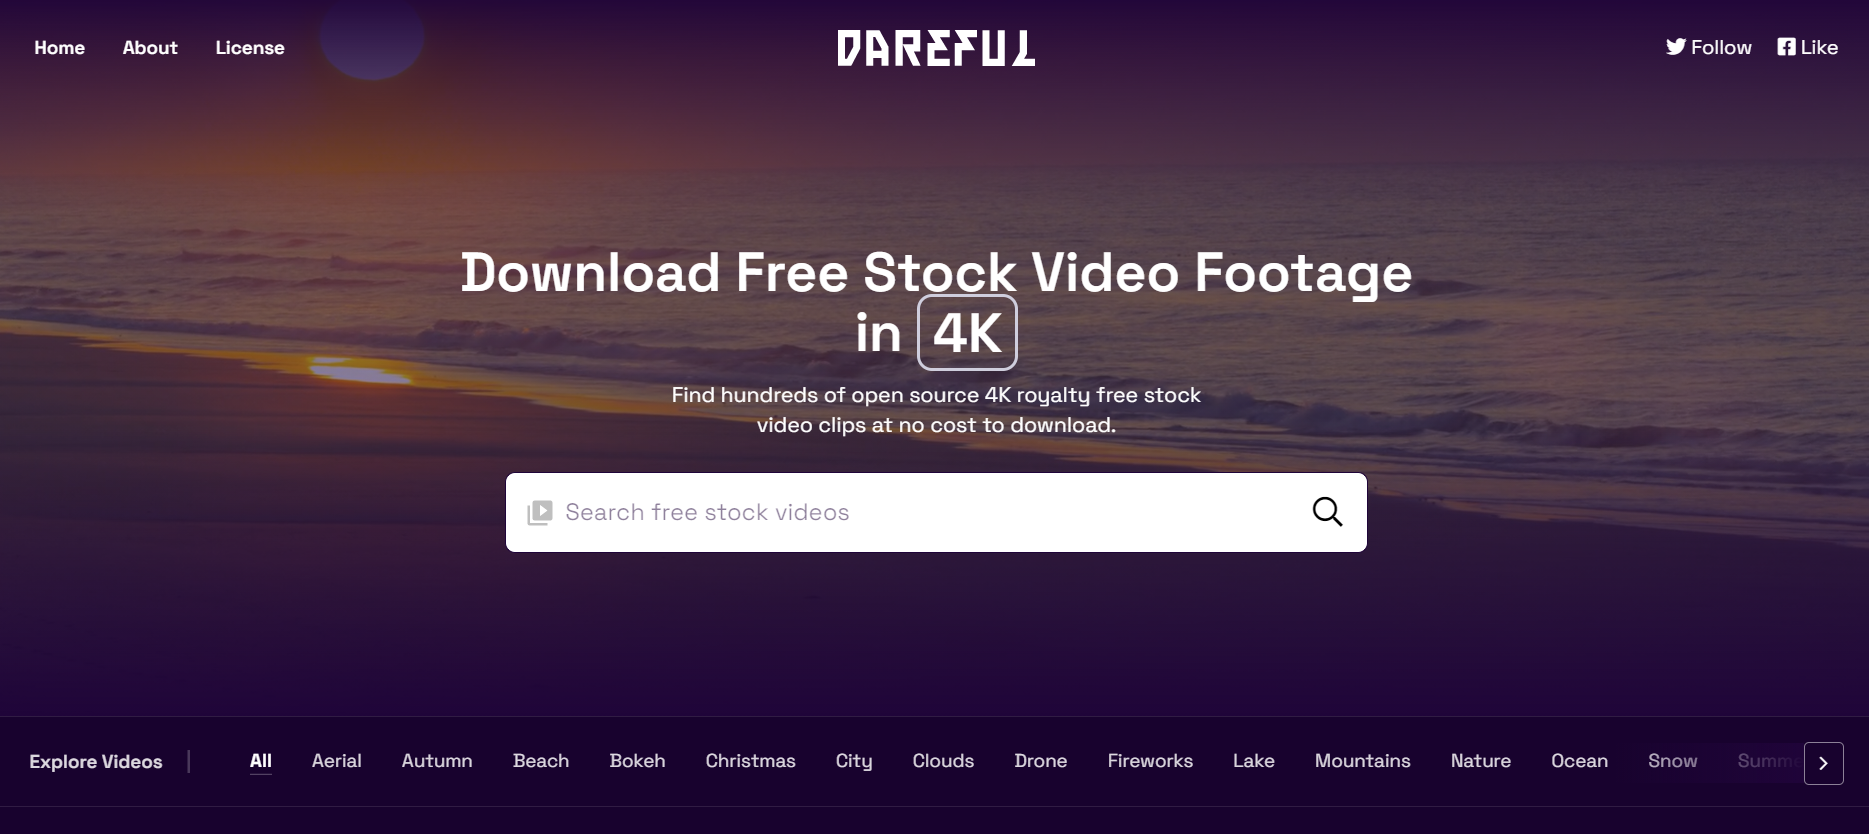 Stock video platform Dareful